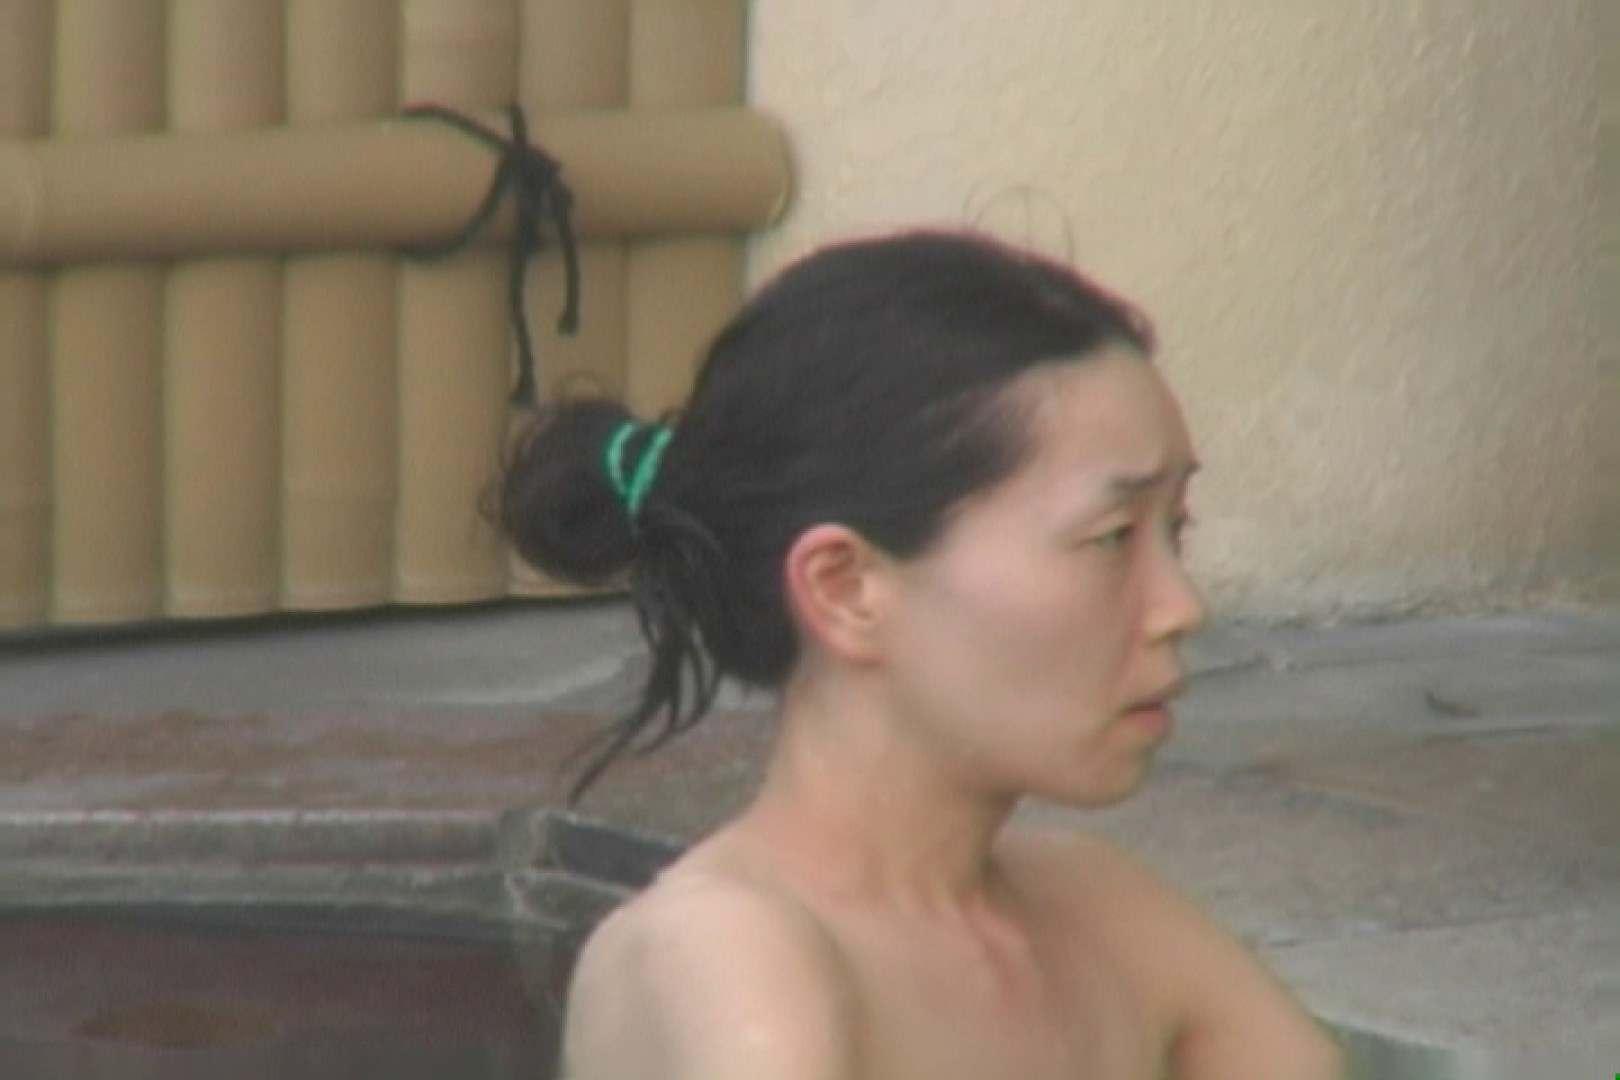 Aquaな露天風呂Vol.577 0 | 0  51連発 19